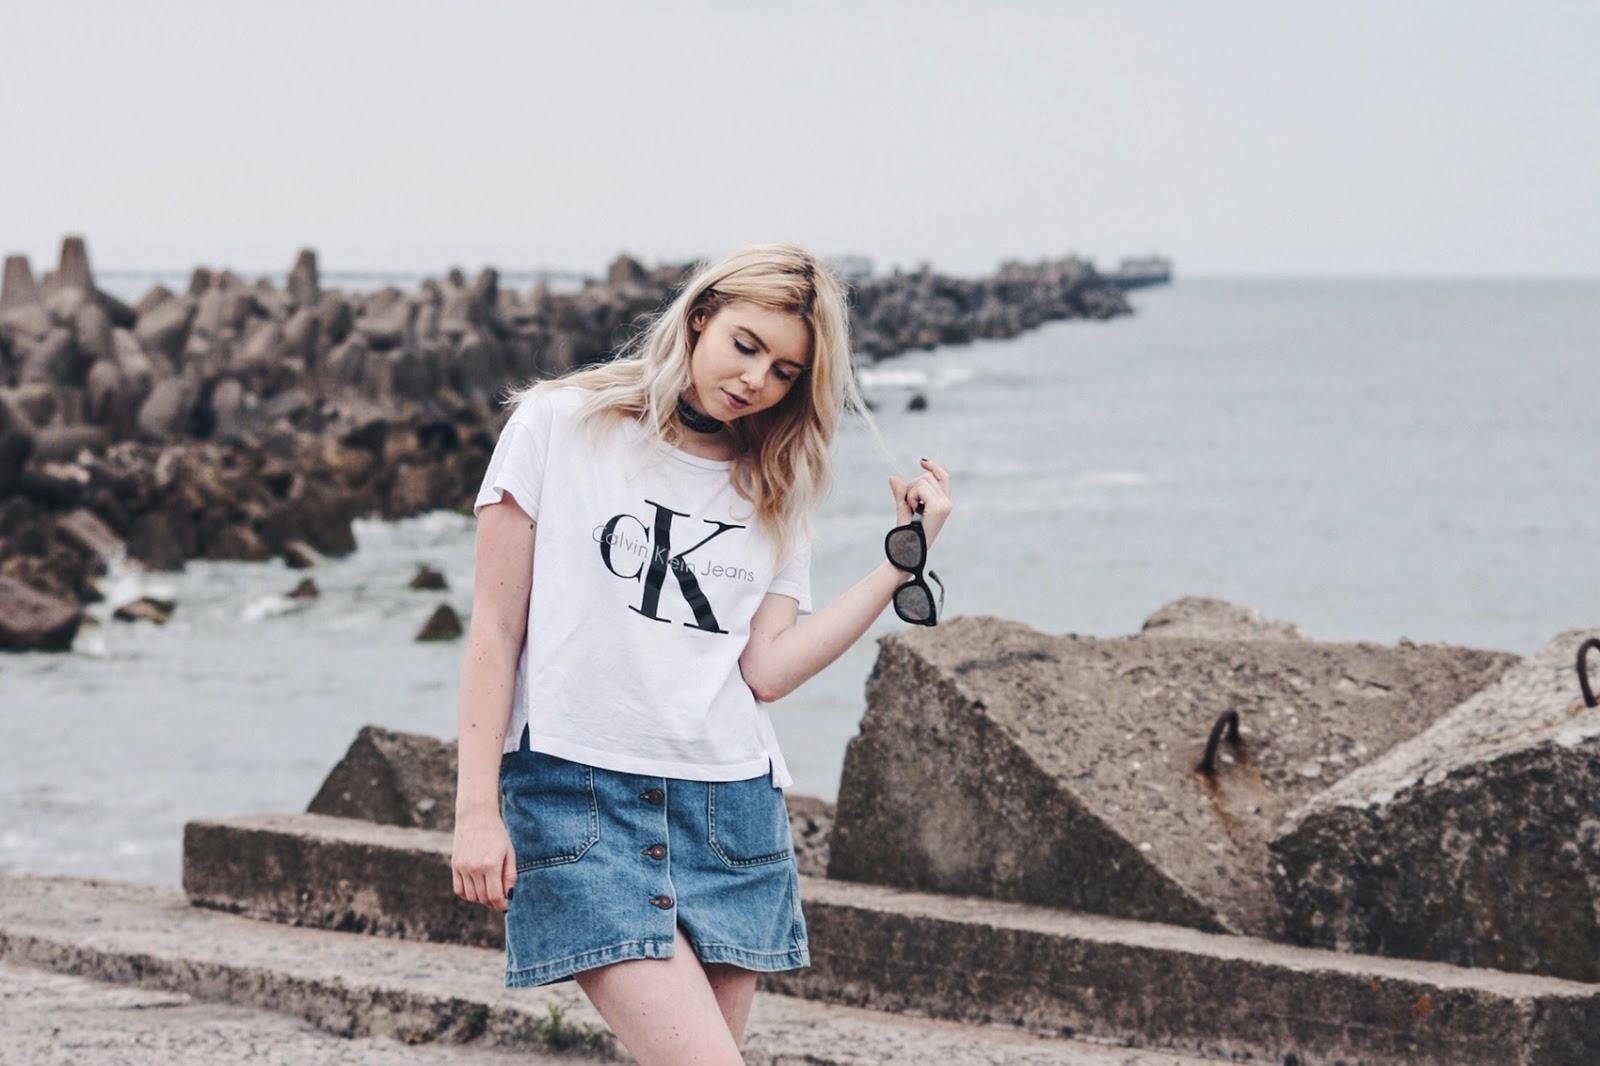 Calvin Klein tshirt, Zara denim skirt, Adidas Stan Smith outfit